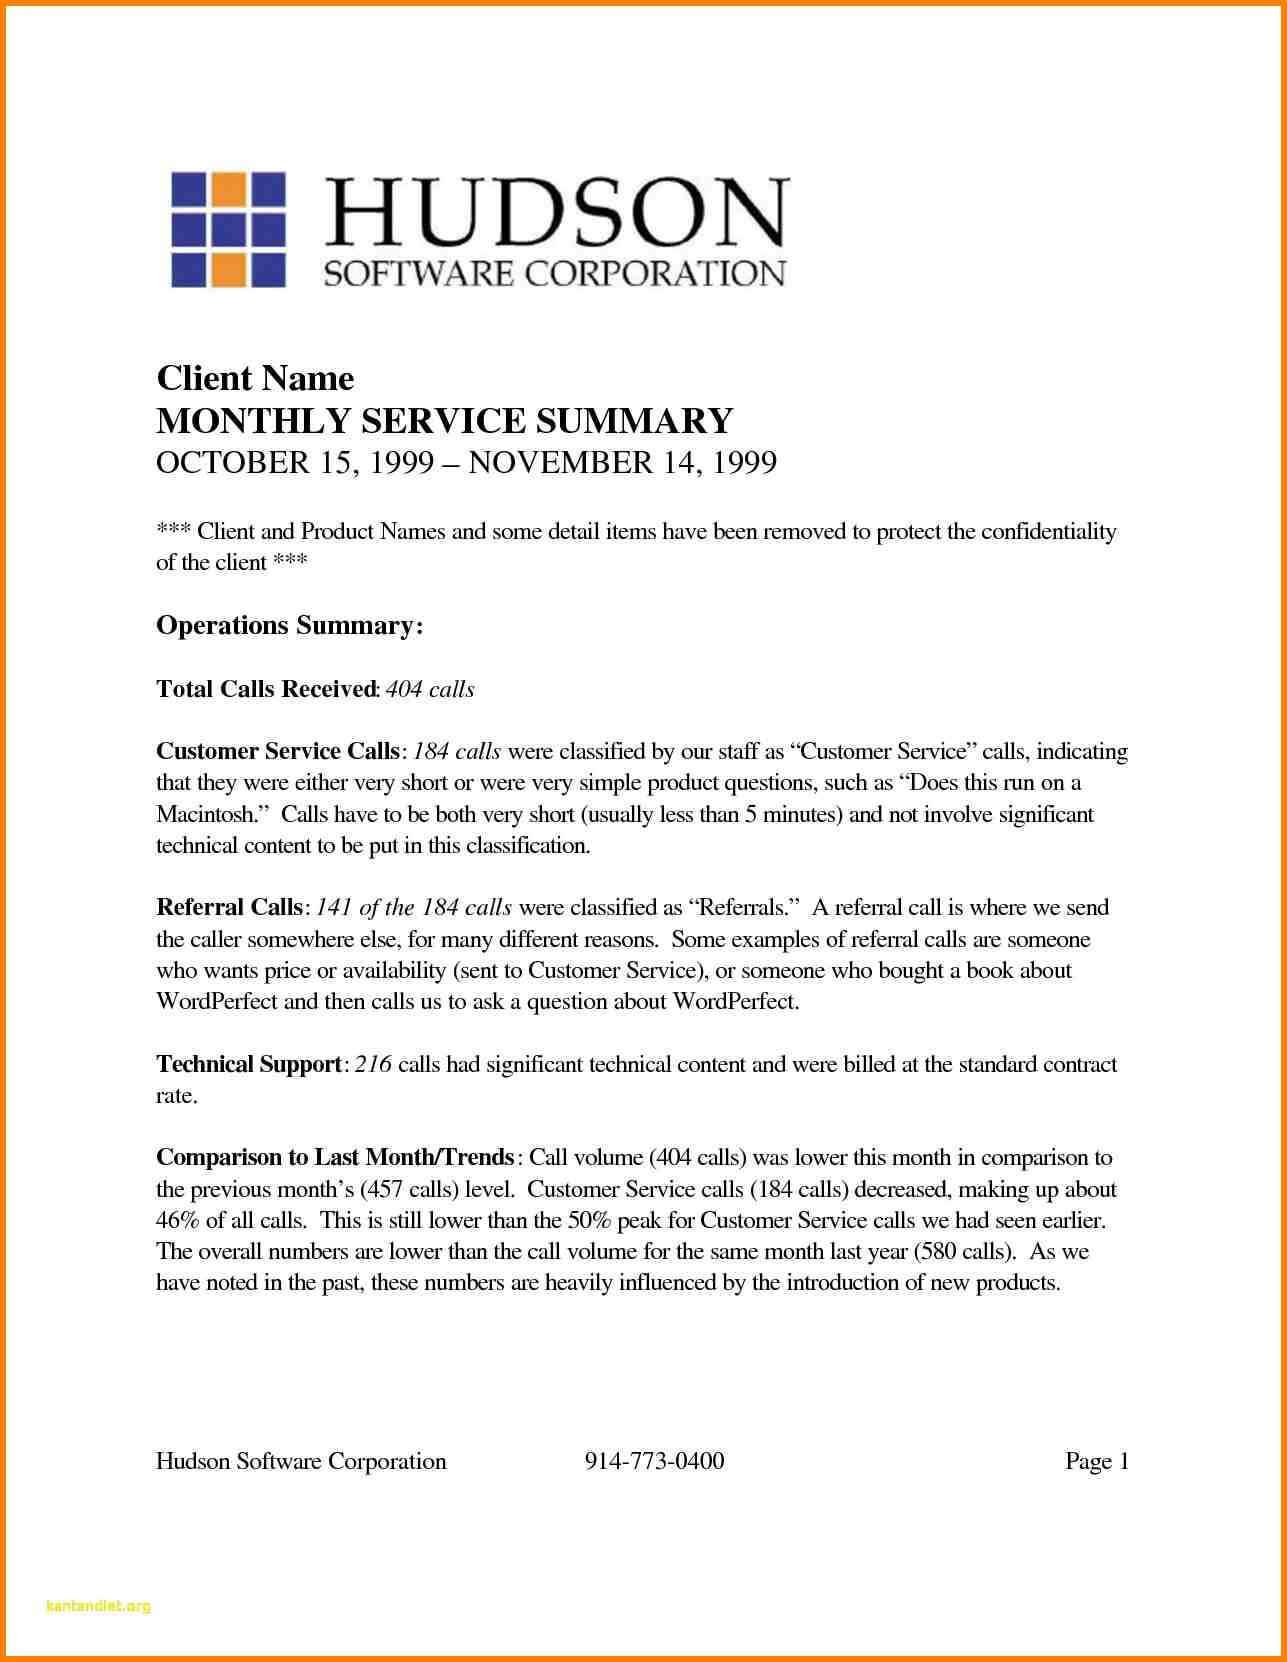 Executive Summary Report Mplate Free Mael Modern Decor Intended For Executive Summary Report Template